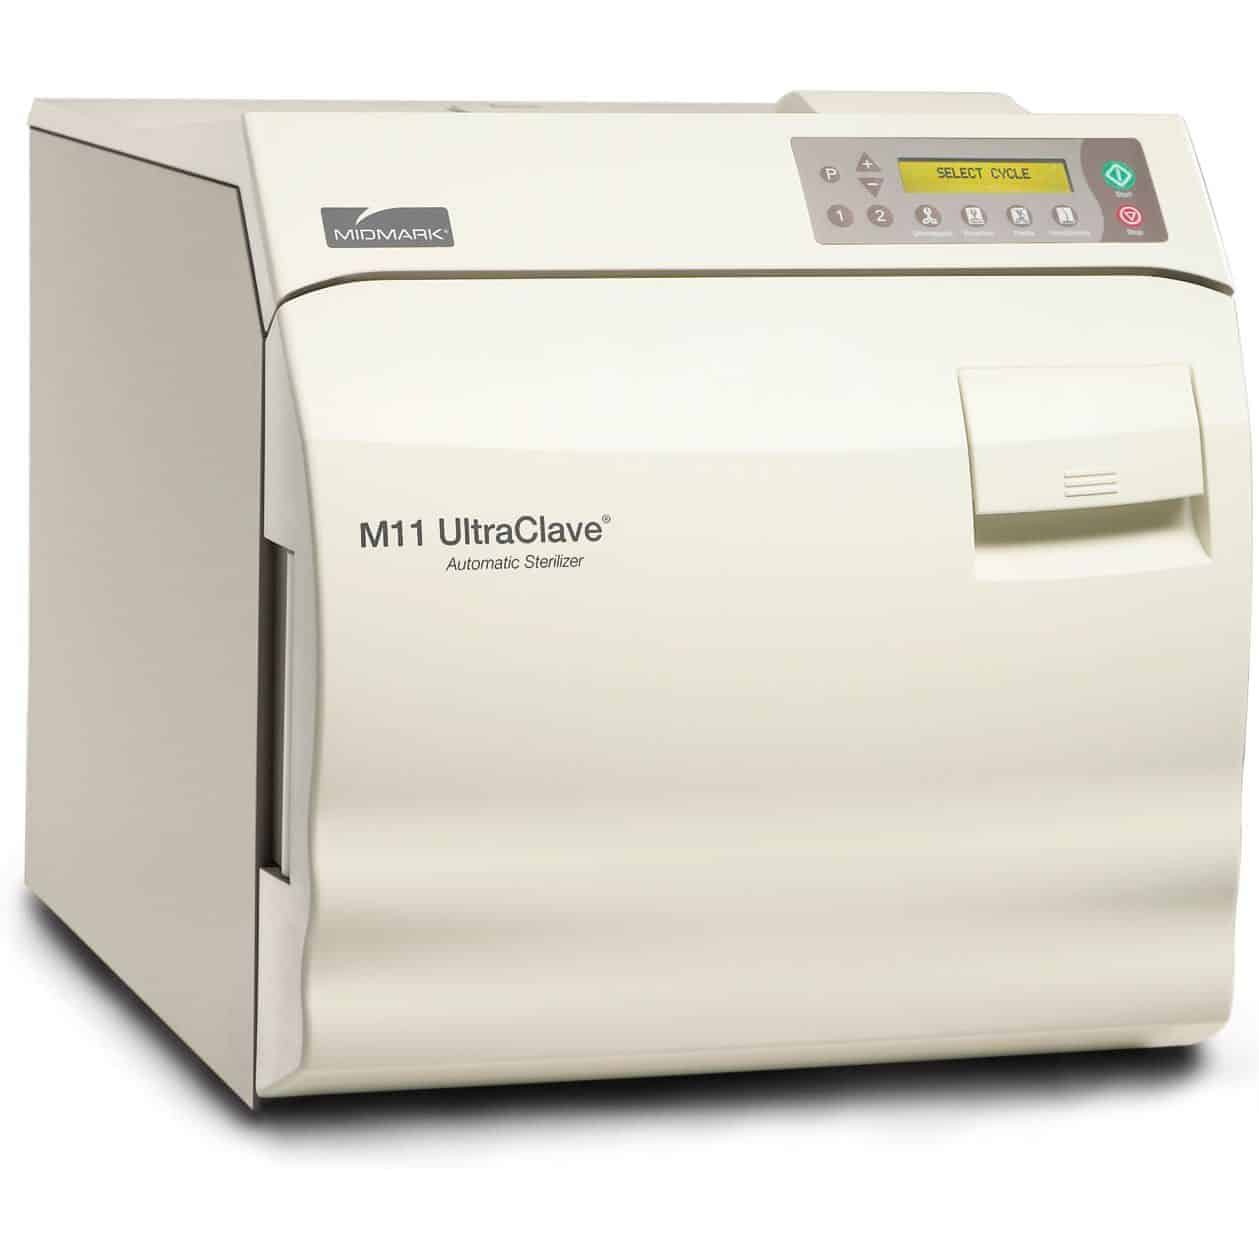 Midmark M11 UltraClave Autoclave Sterilizer